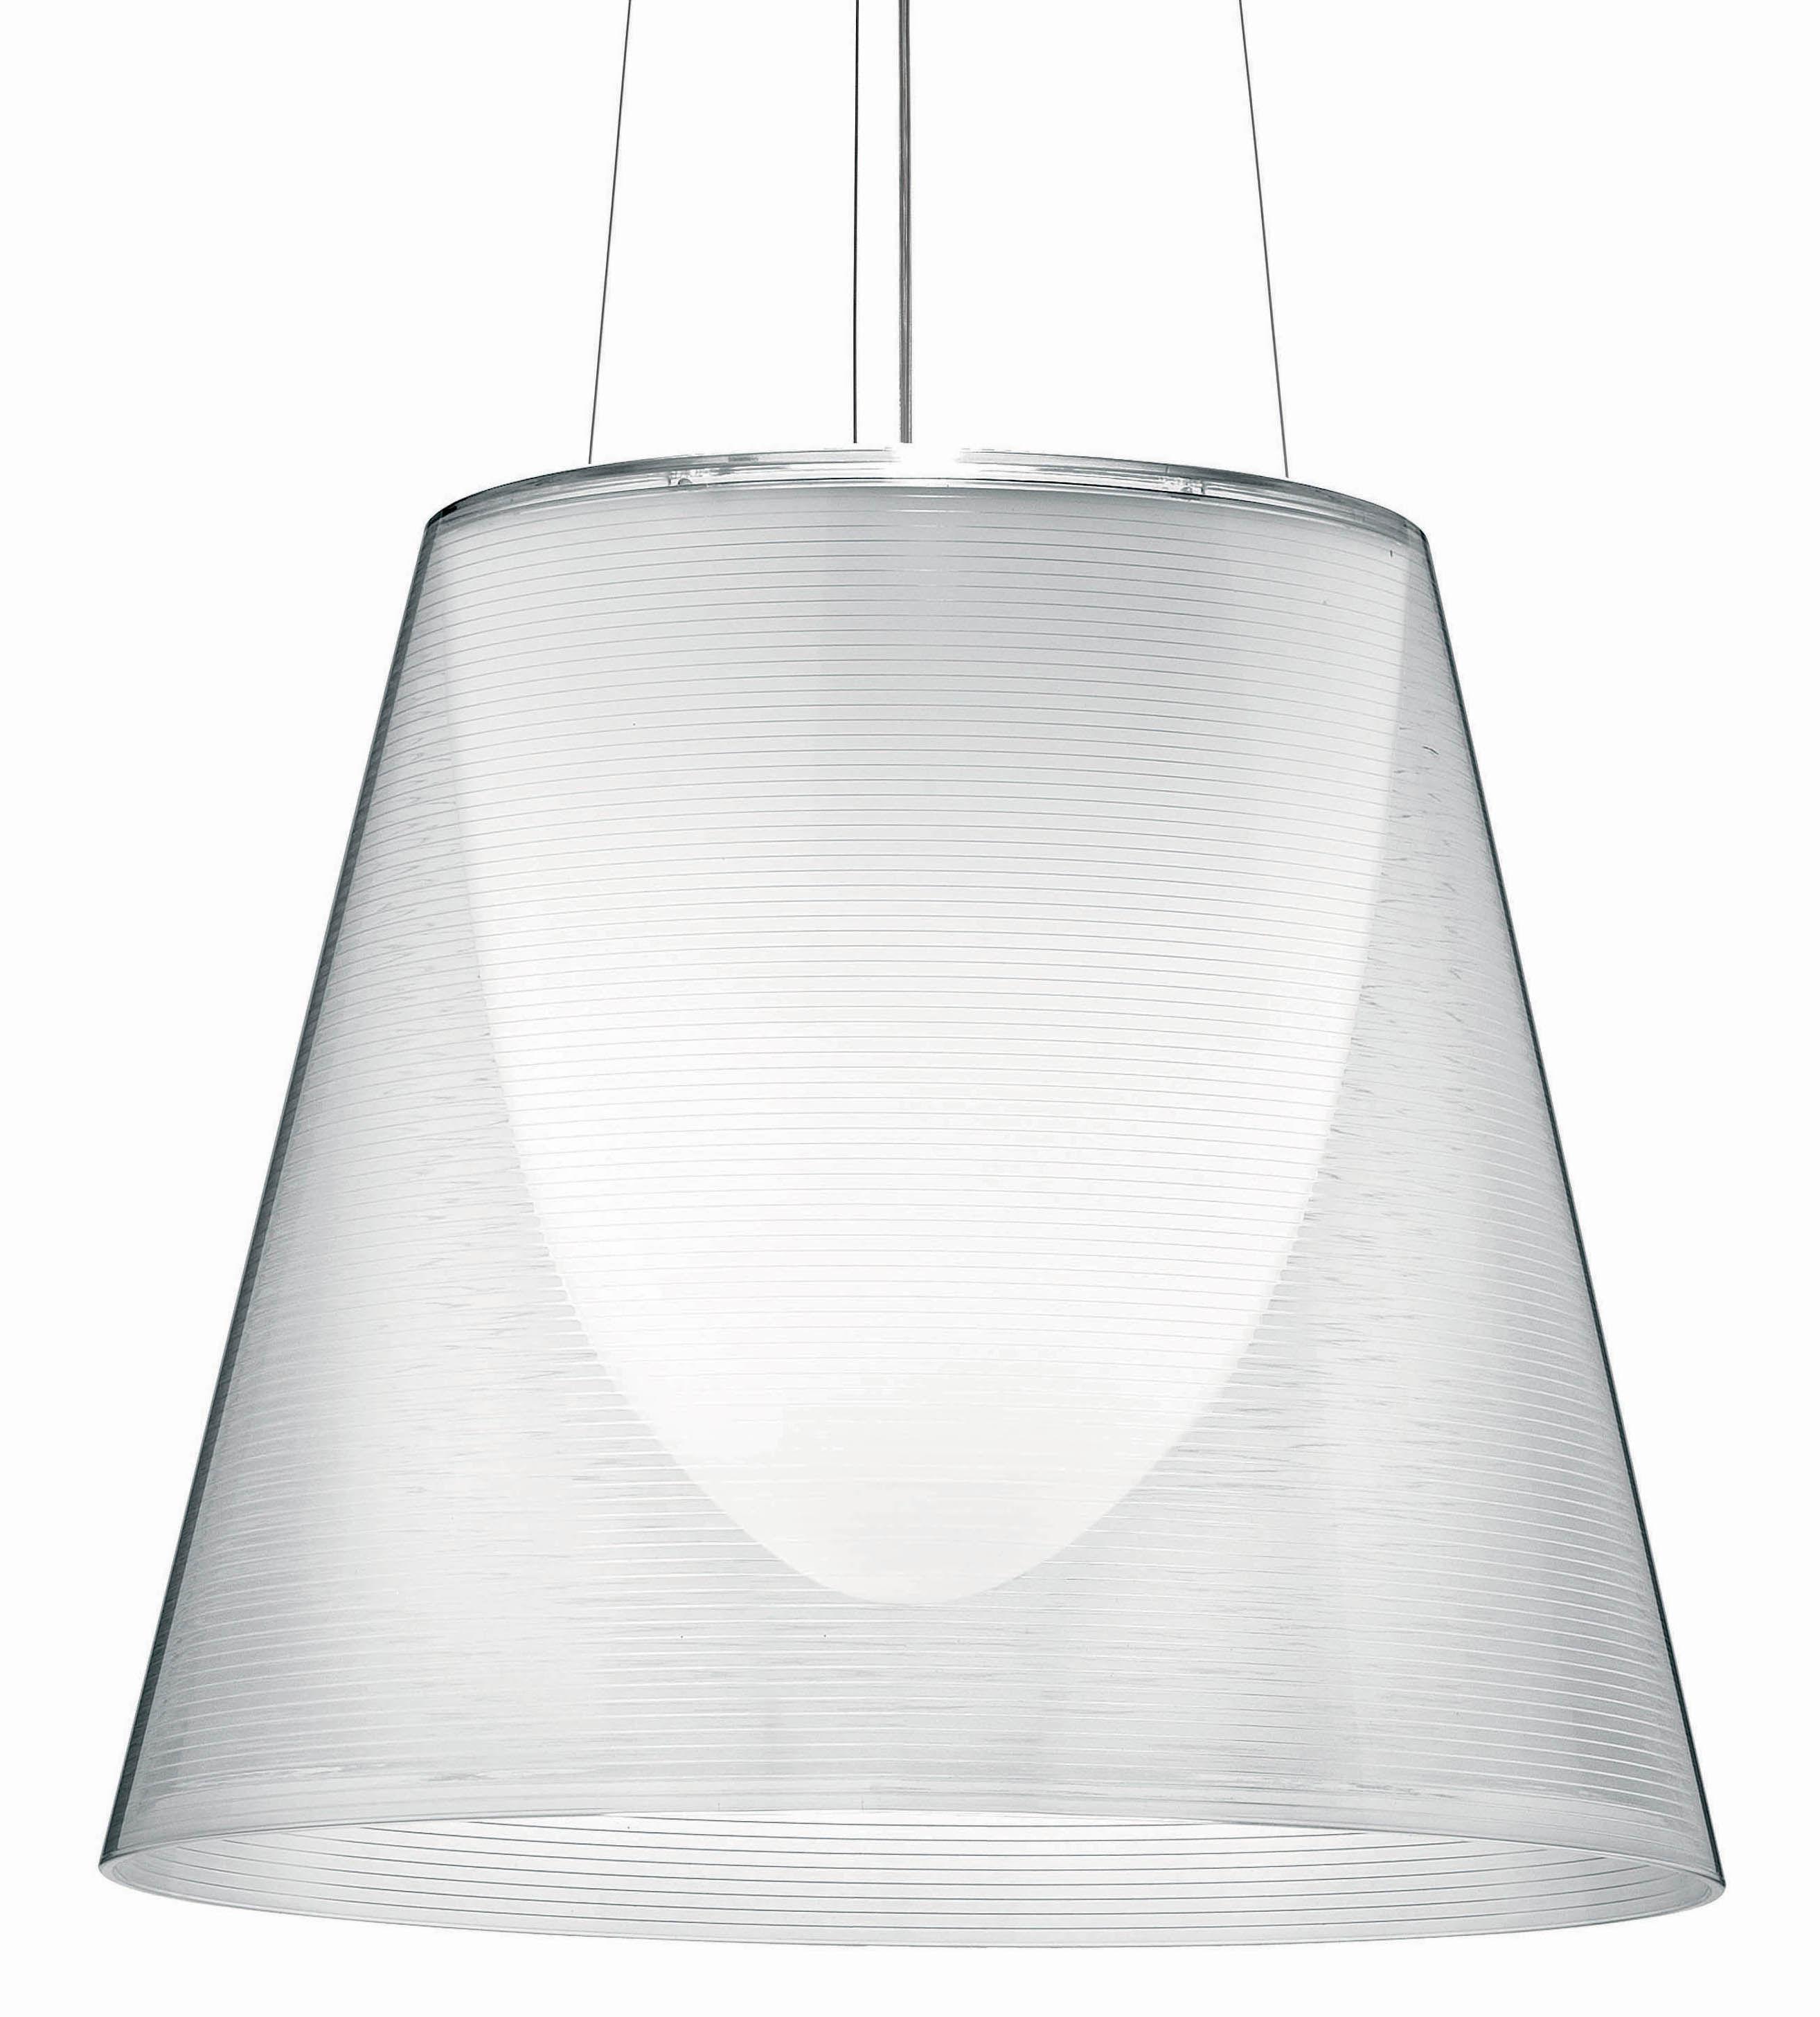 Illuminazione - Lampadari - Sospensione K Tribe S3 - Ø 55 cm di Flos - Trasparente - PMMA